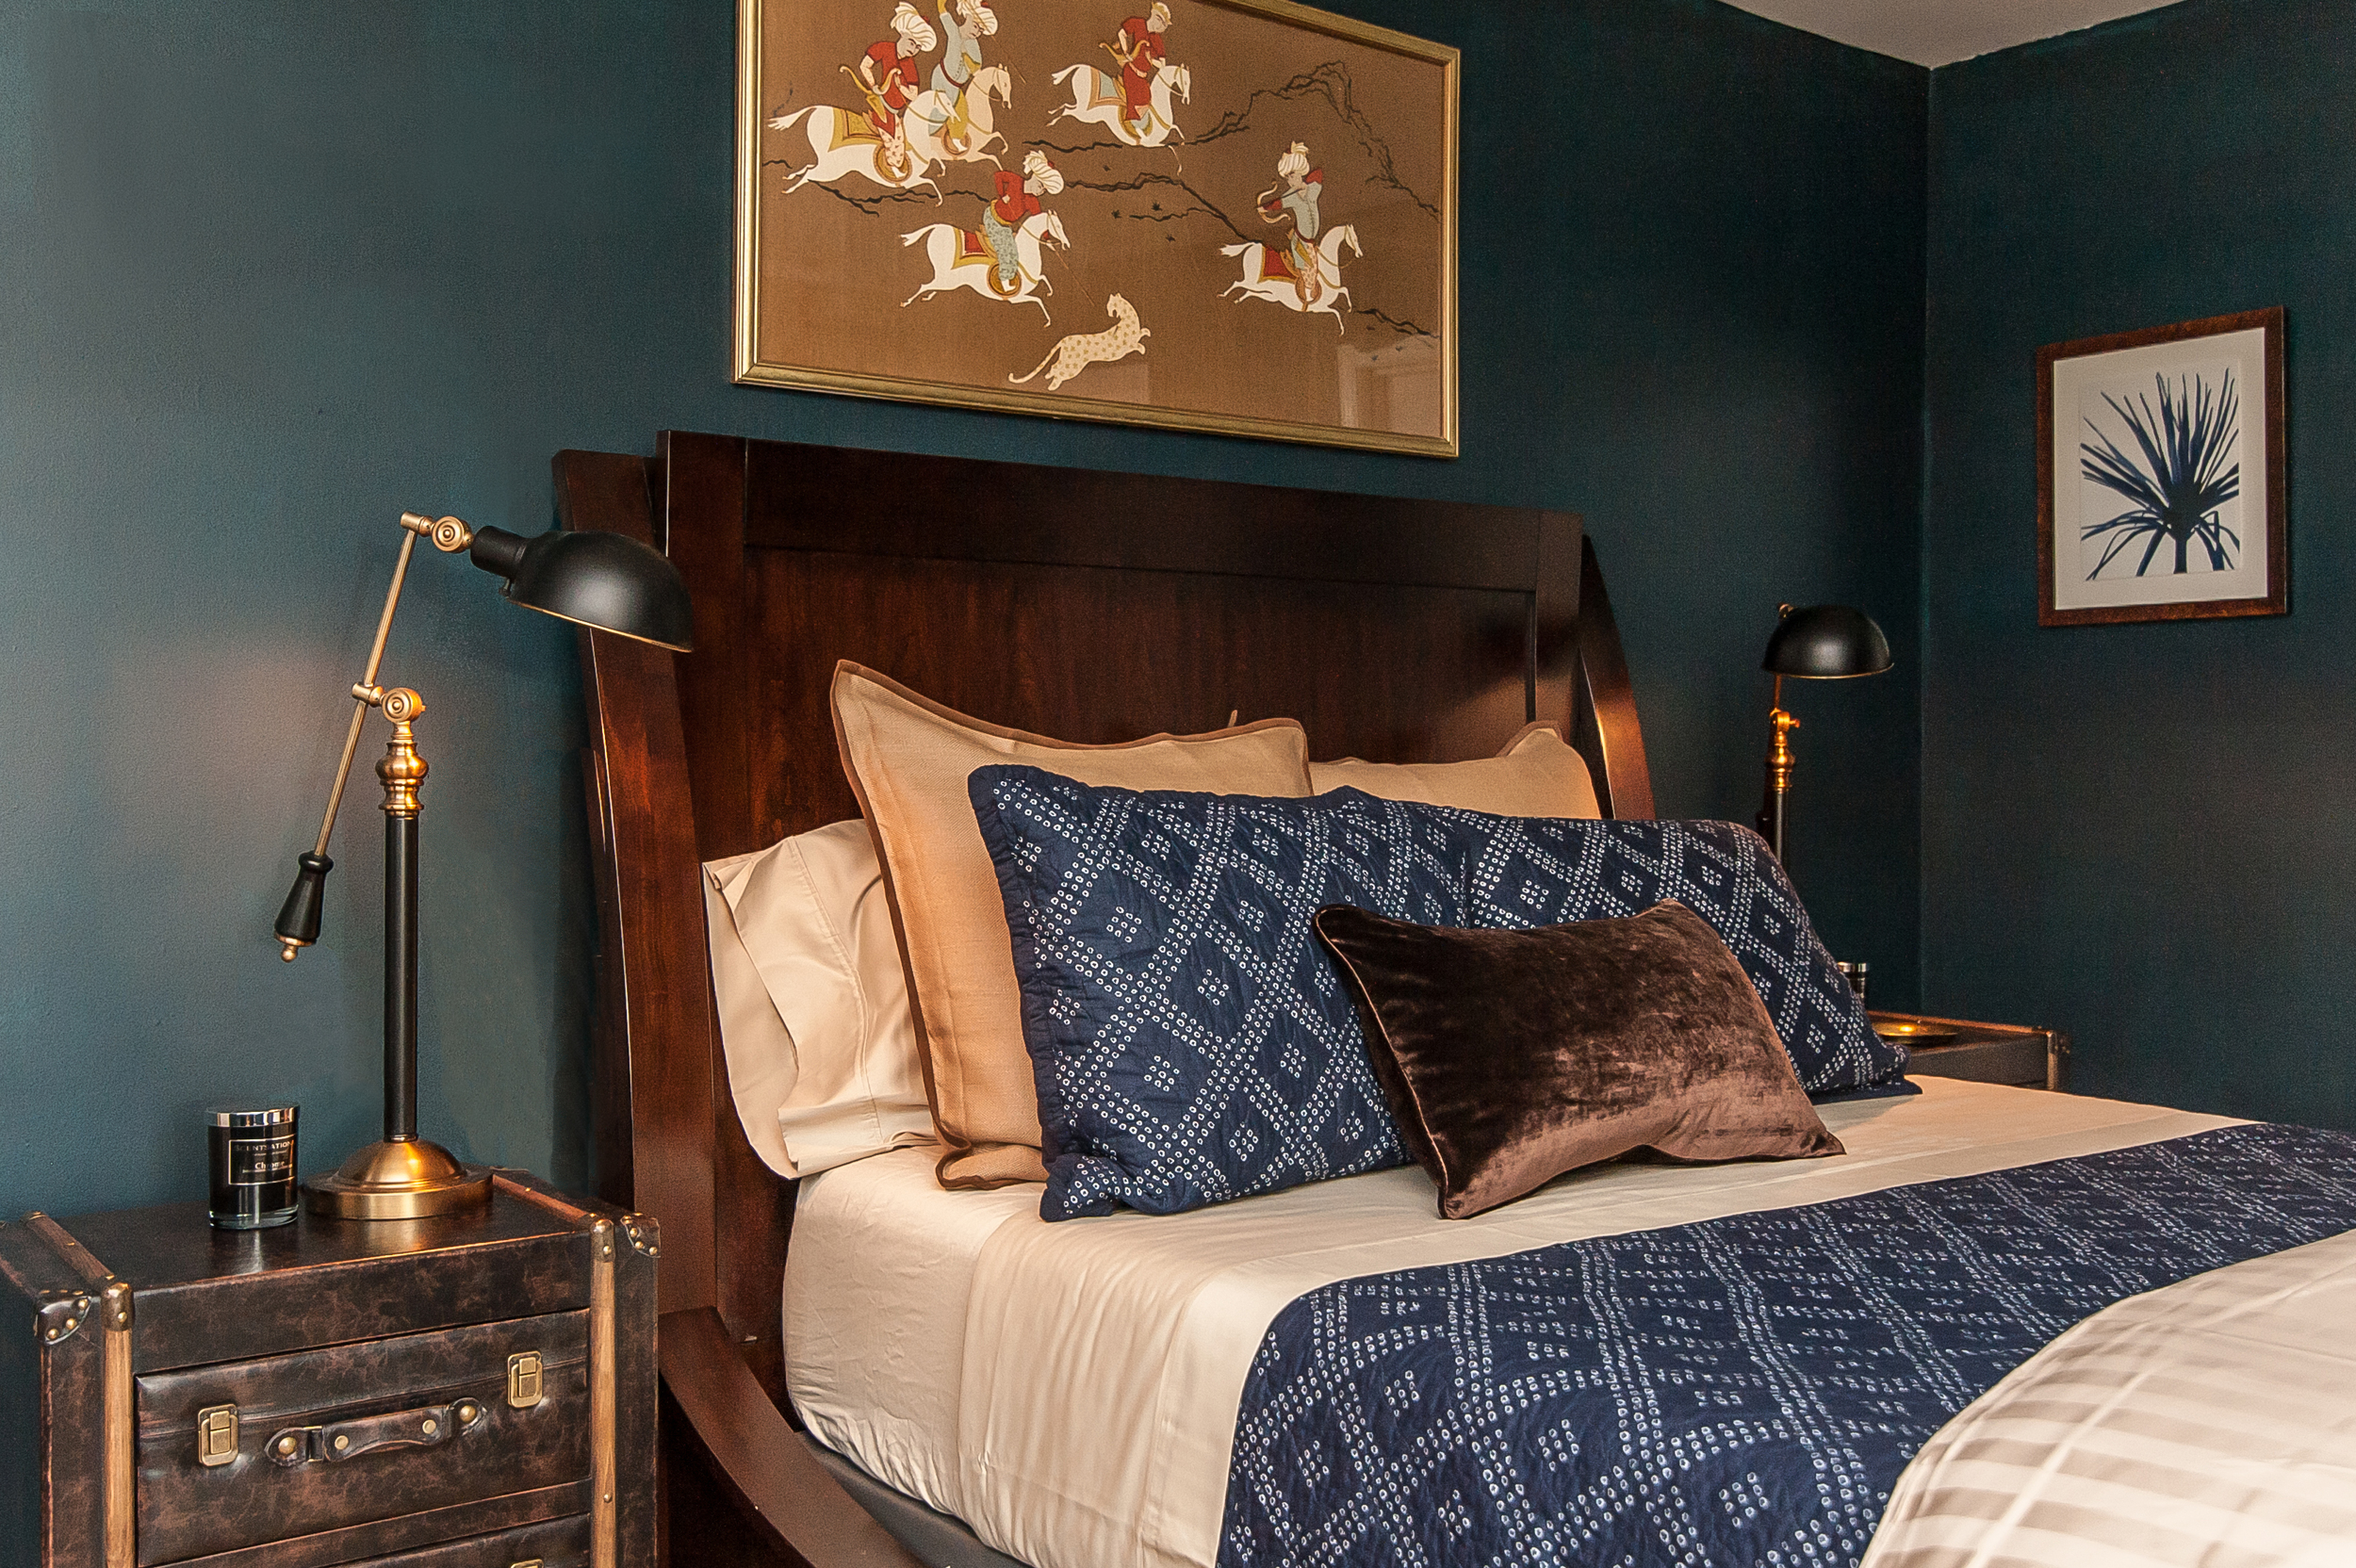 Artful Interiors - Bachelor Pad - Master Bedroom 3